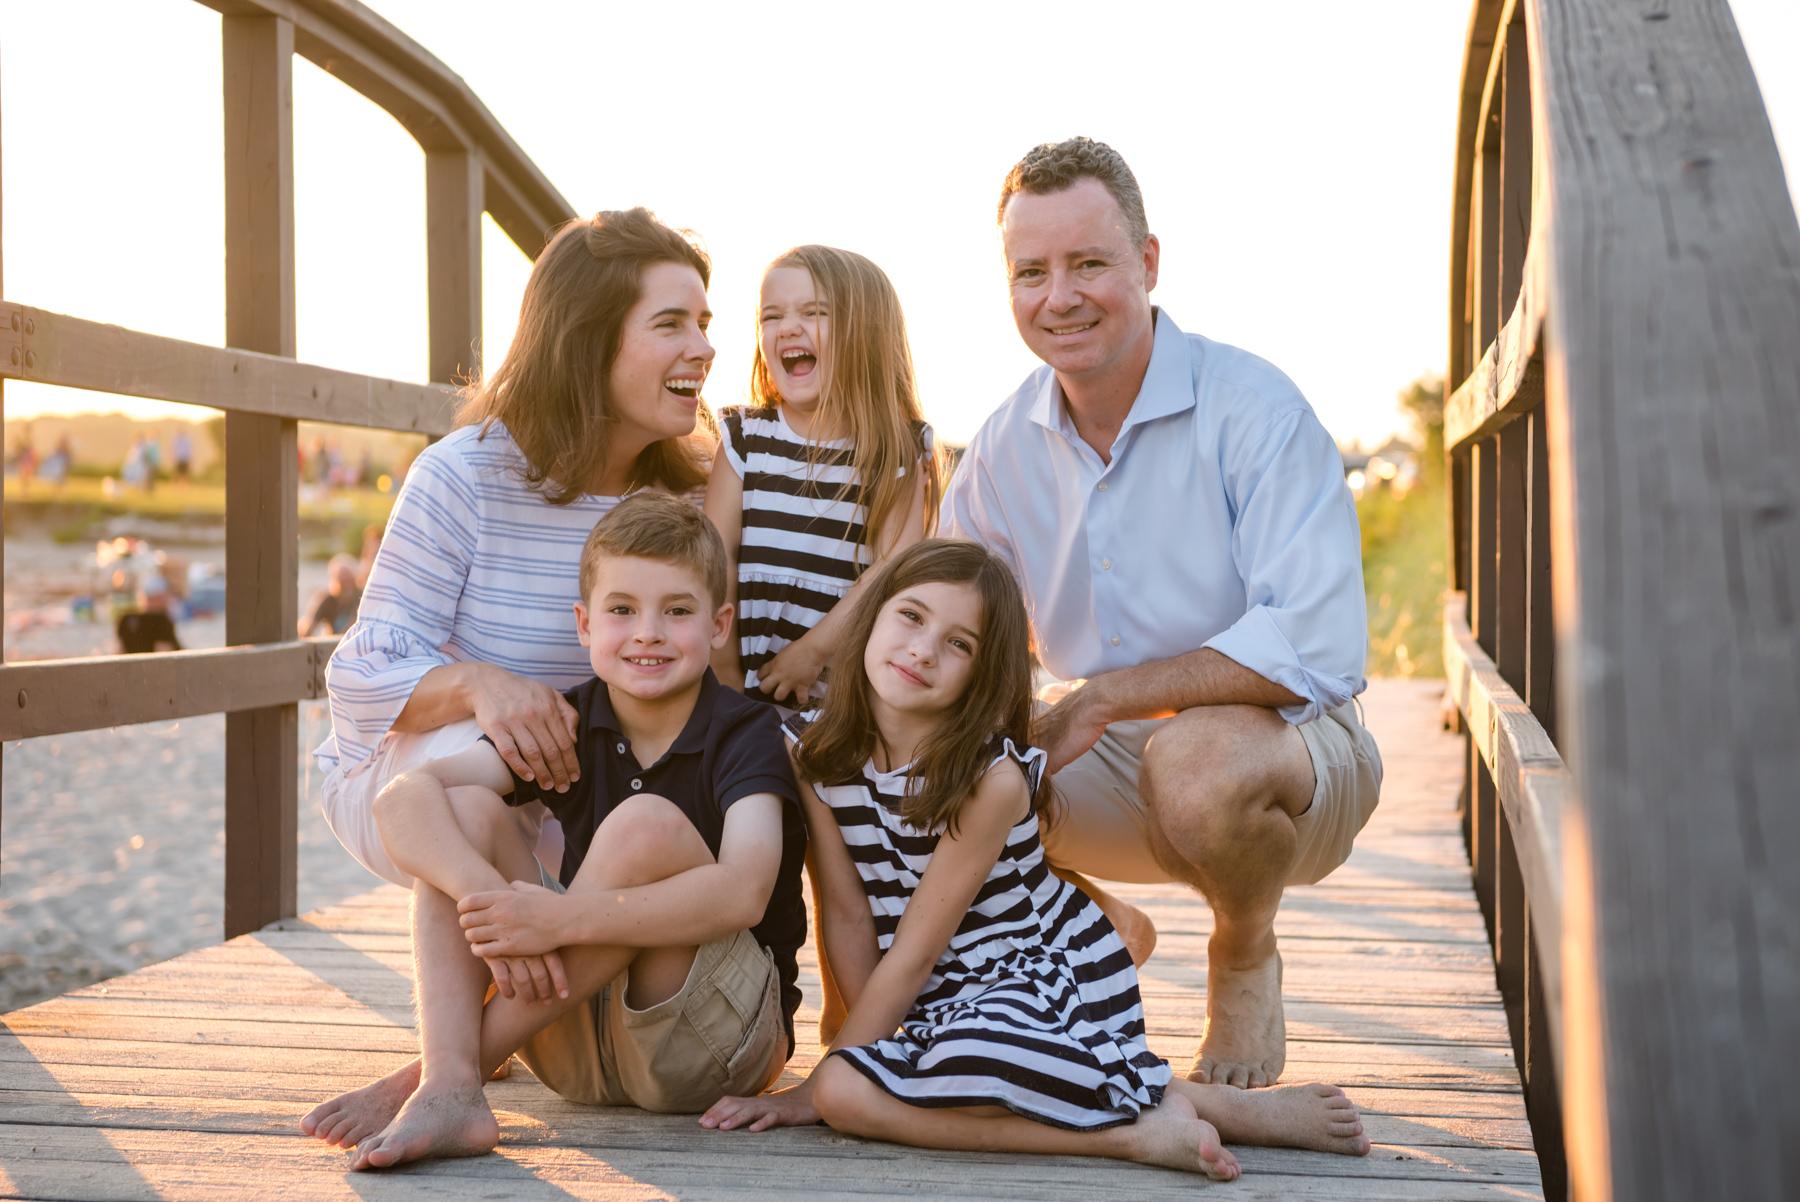 Ferrybeachfamilysession